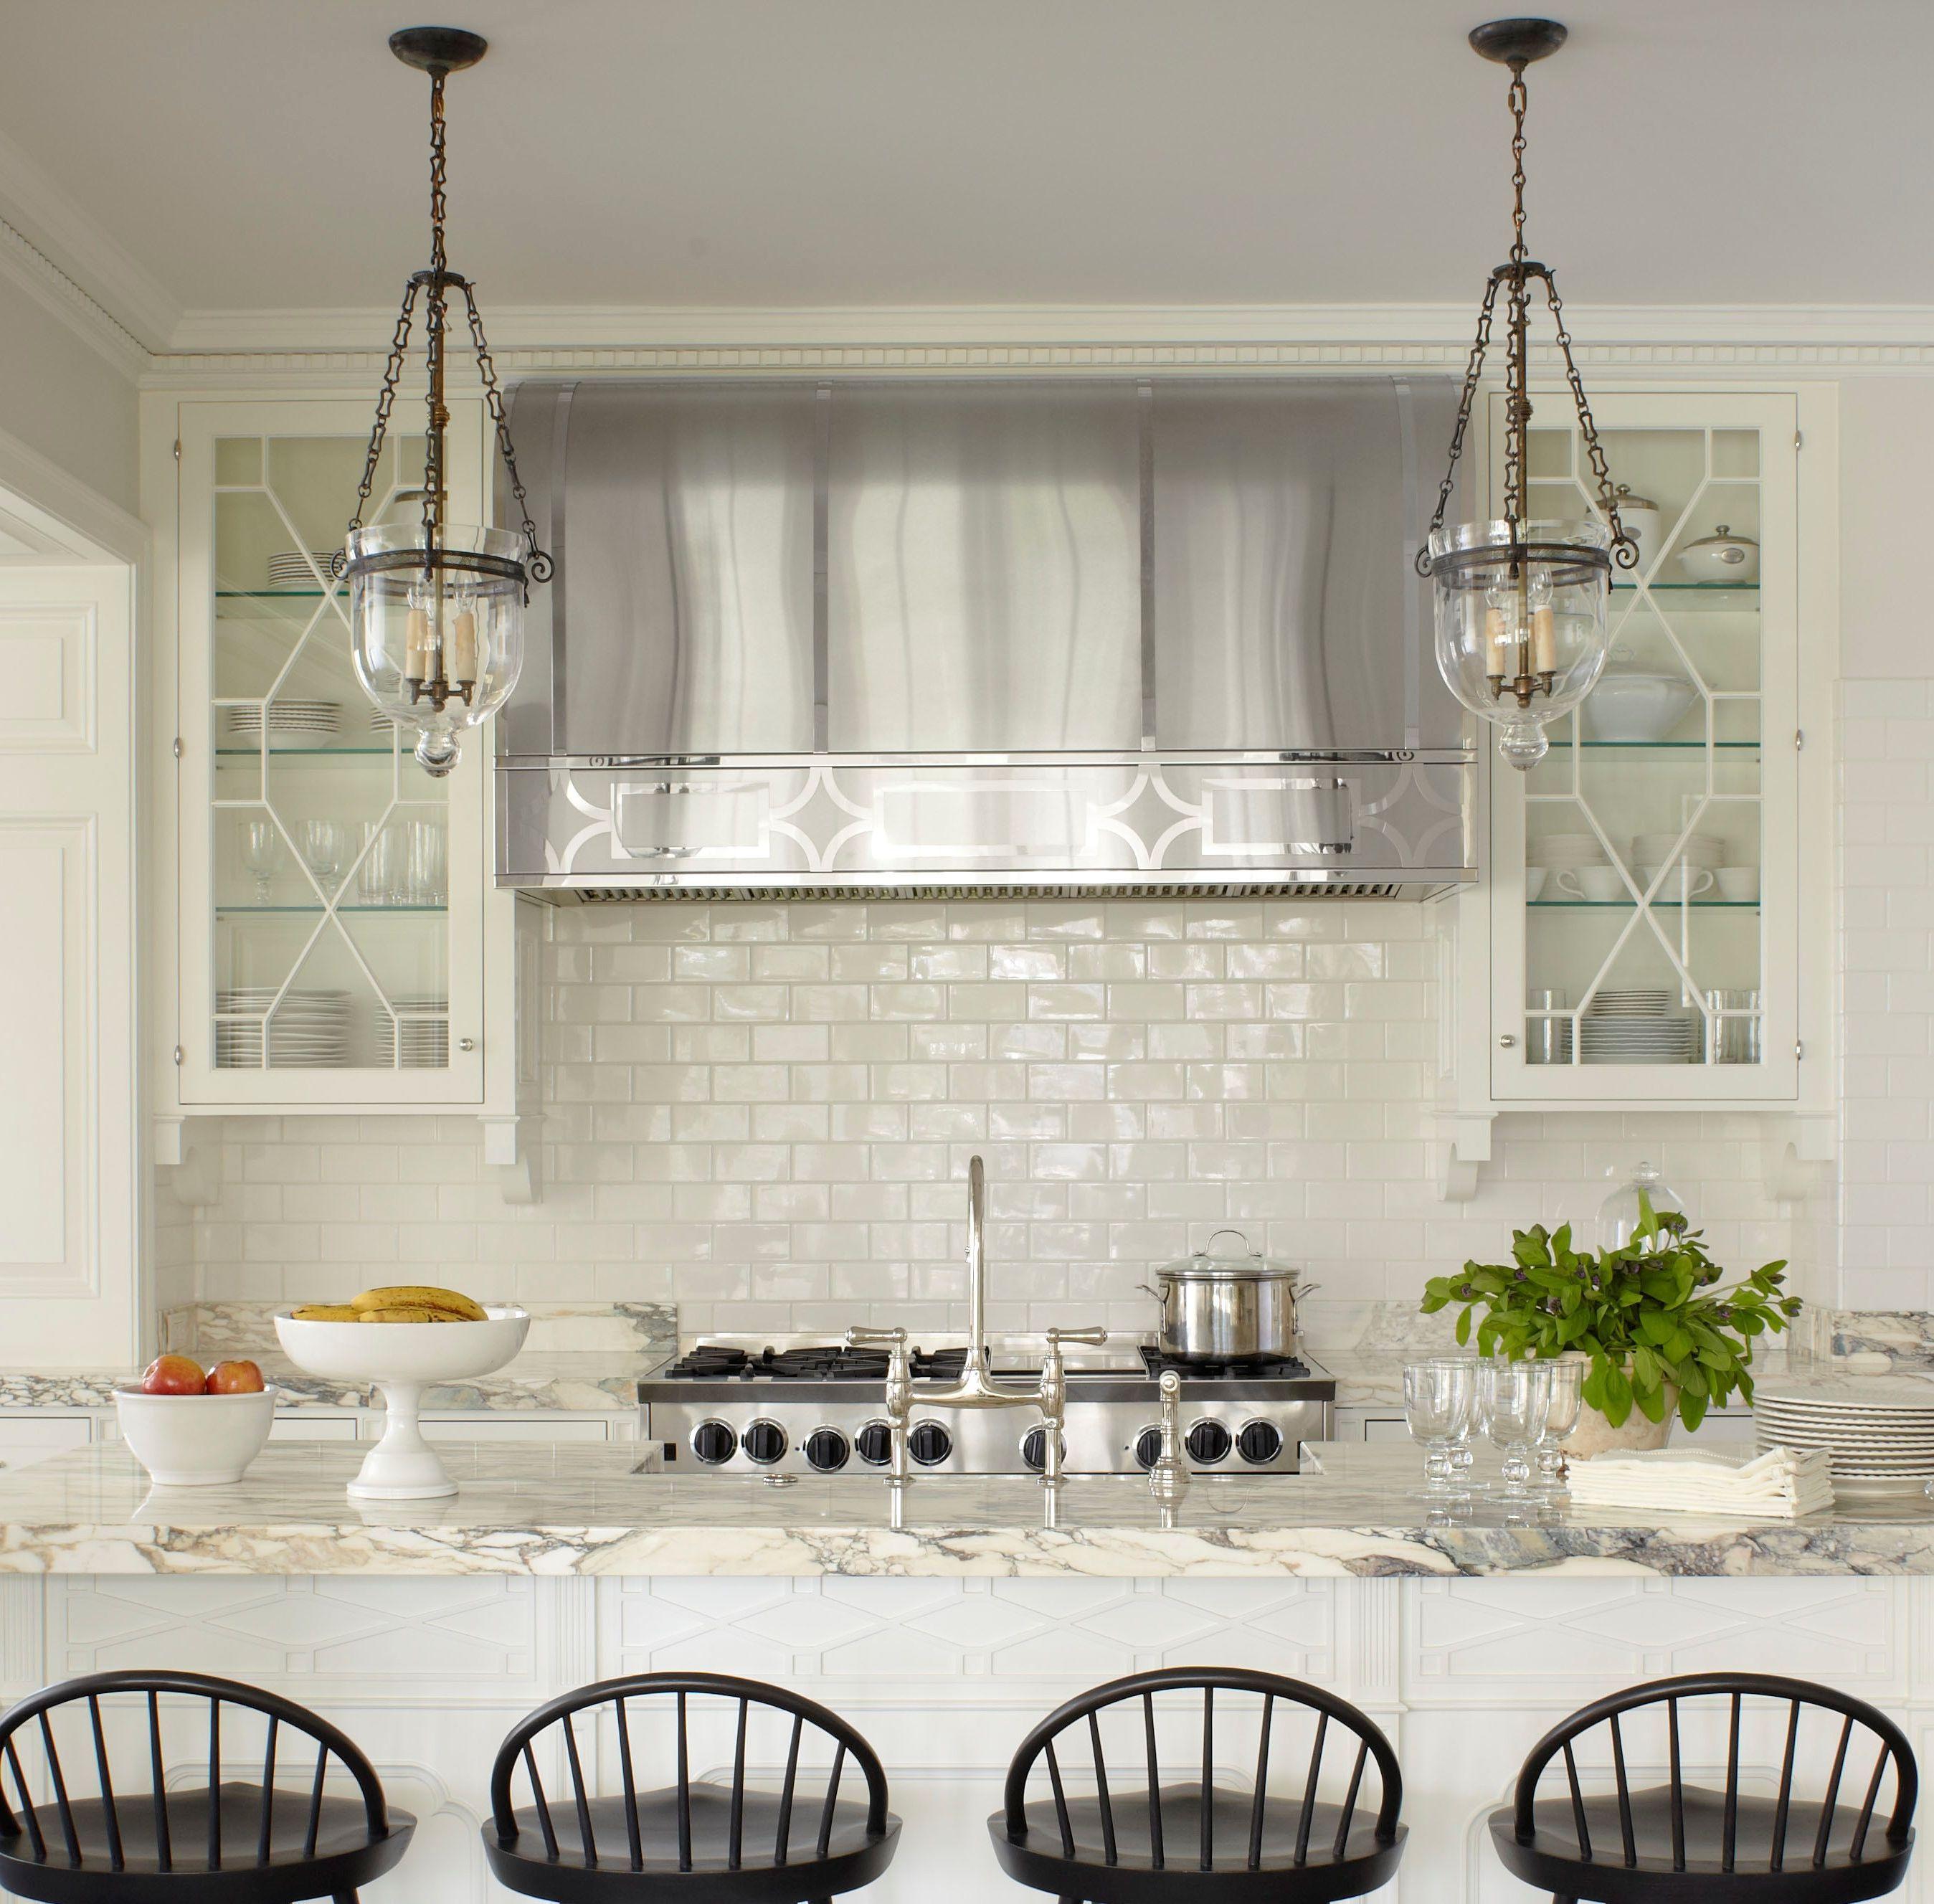 Best Kitchen Gallery: Kitchen Extravagant Kitchen Hood Designs For Beautiful Cooking of Metal Kitchen Hoods on rachelxblog.com